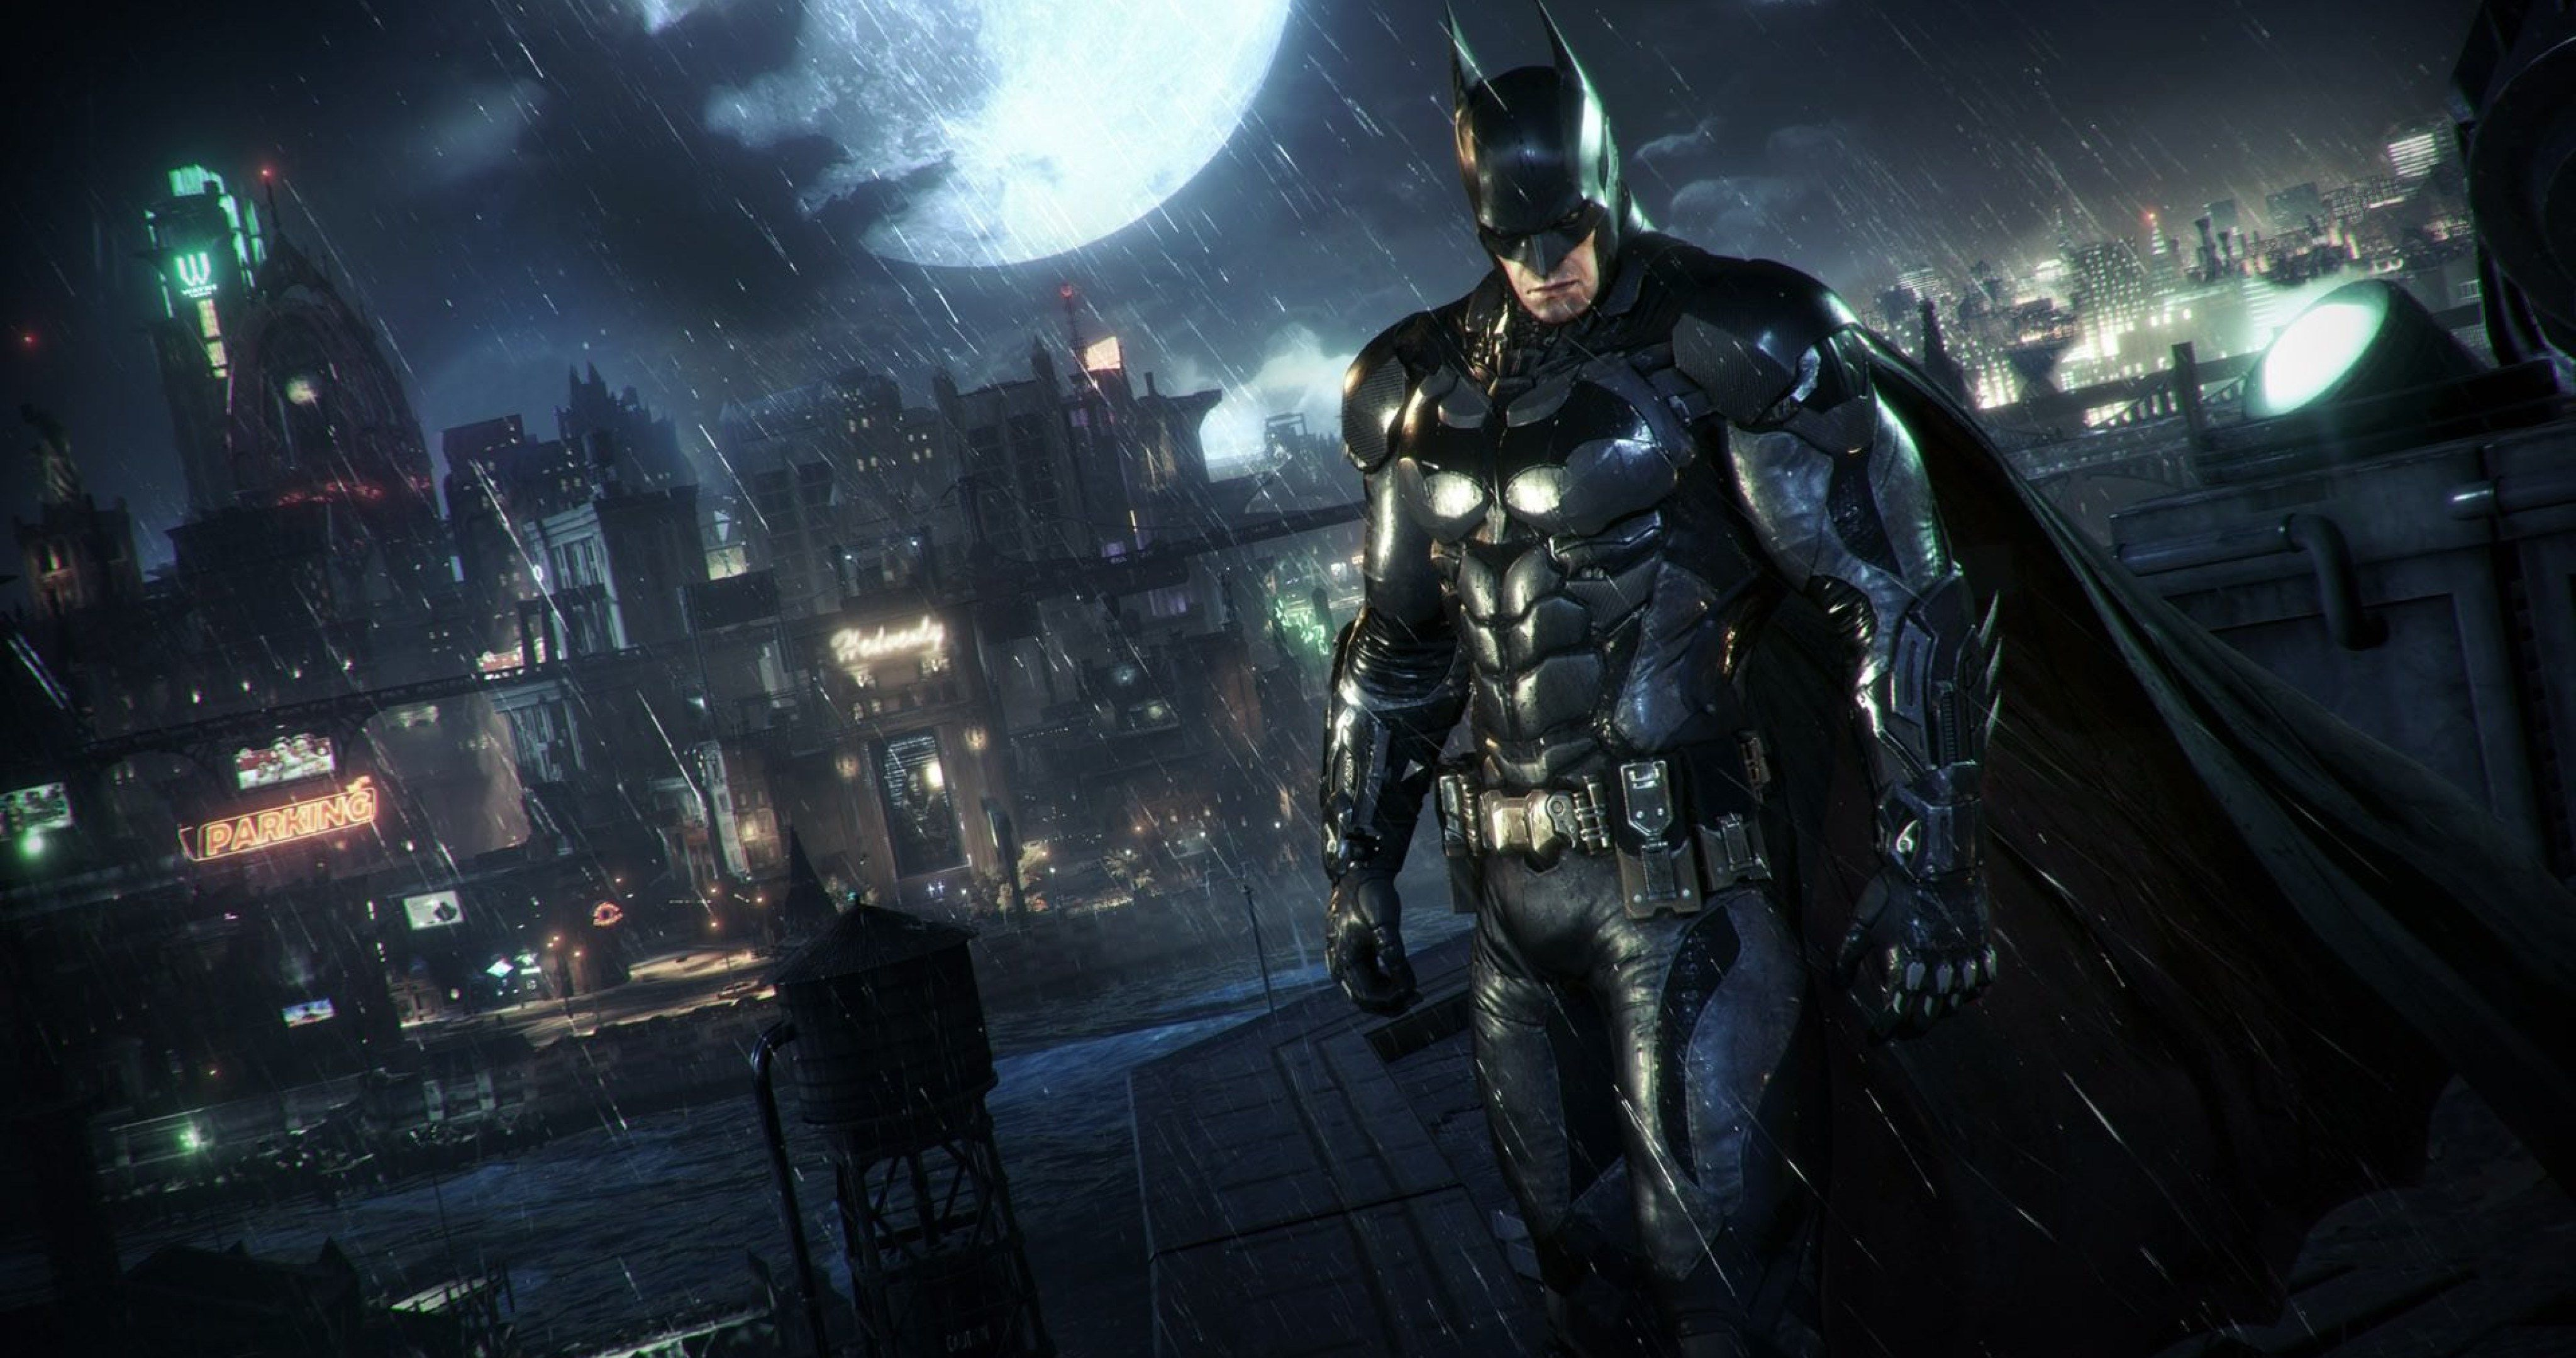 Batman Arkham Knight Video Game 4k Ultra Hd Wallpaper